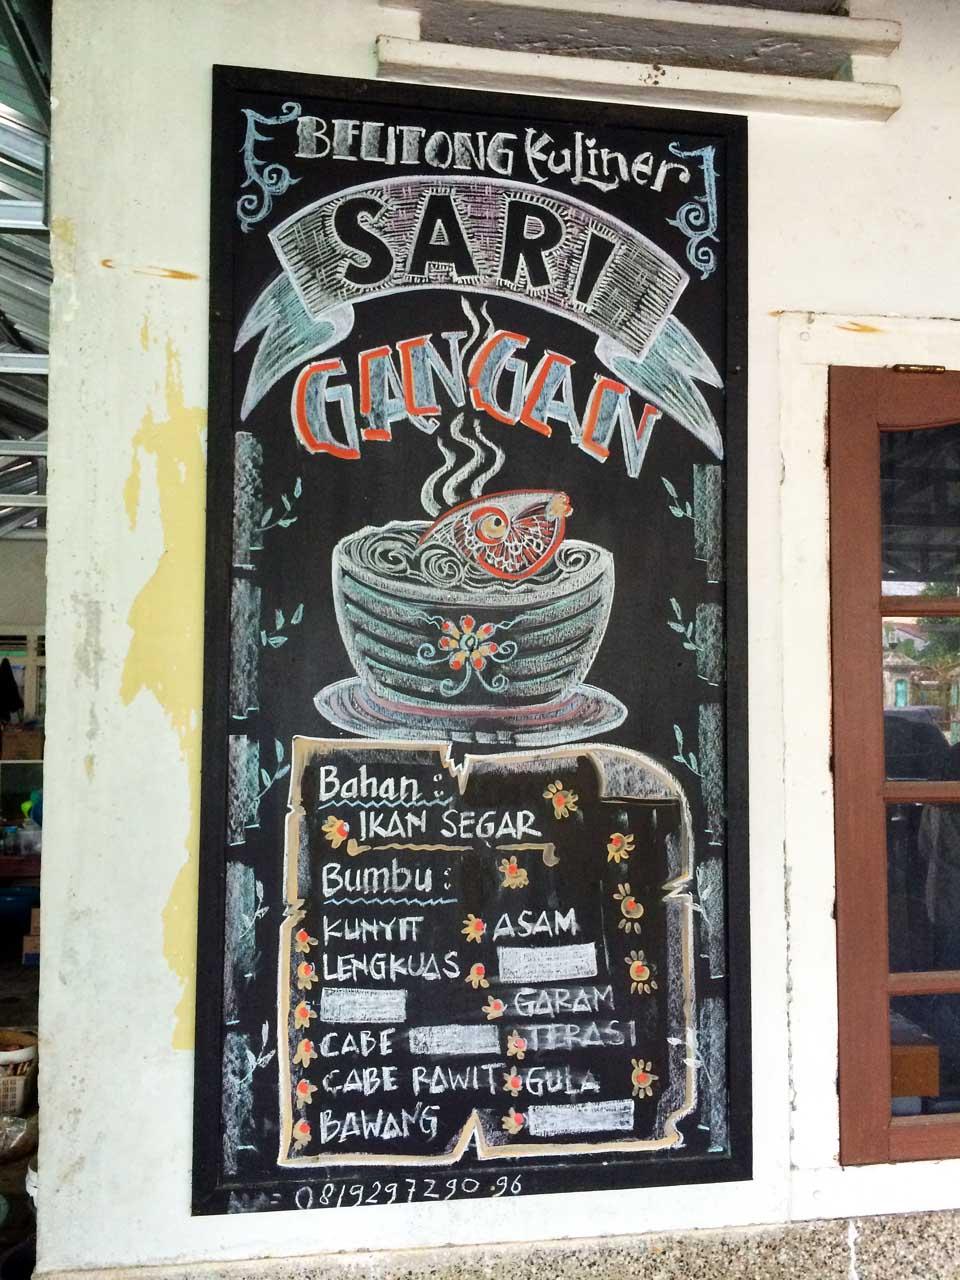 Sop Gangan - RM Sari Gangan - Kuliner Belitung - Yopie Pangkey - 2